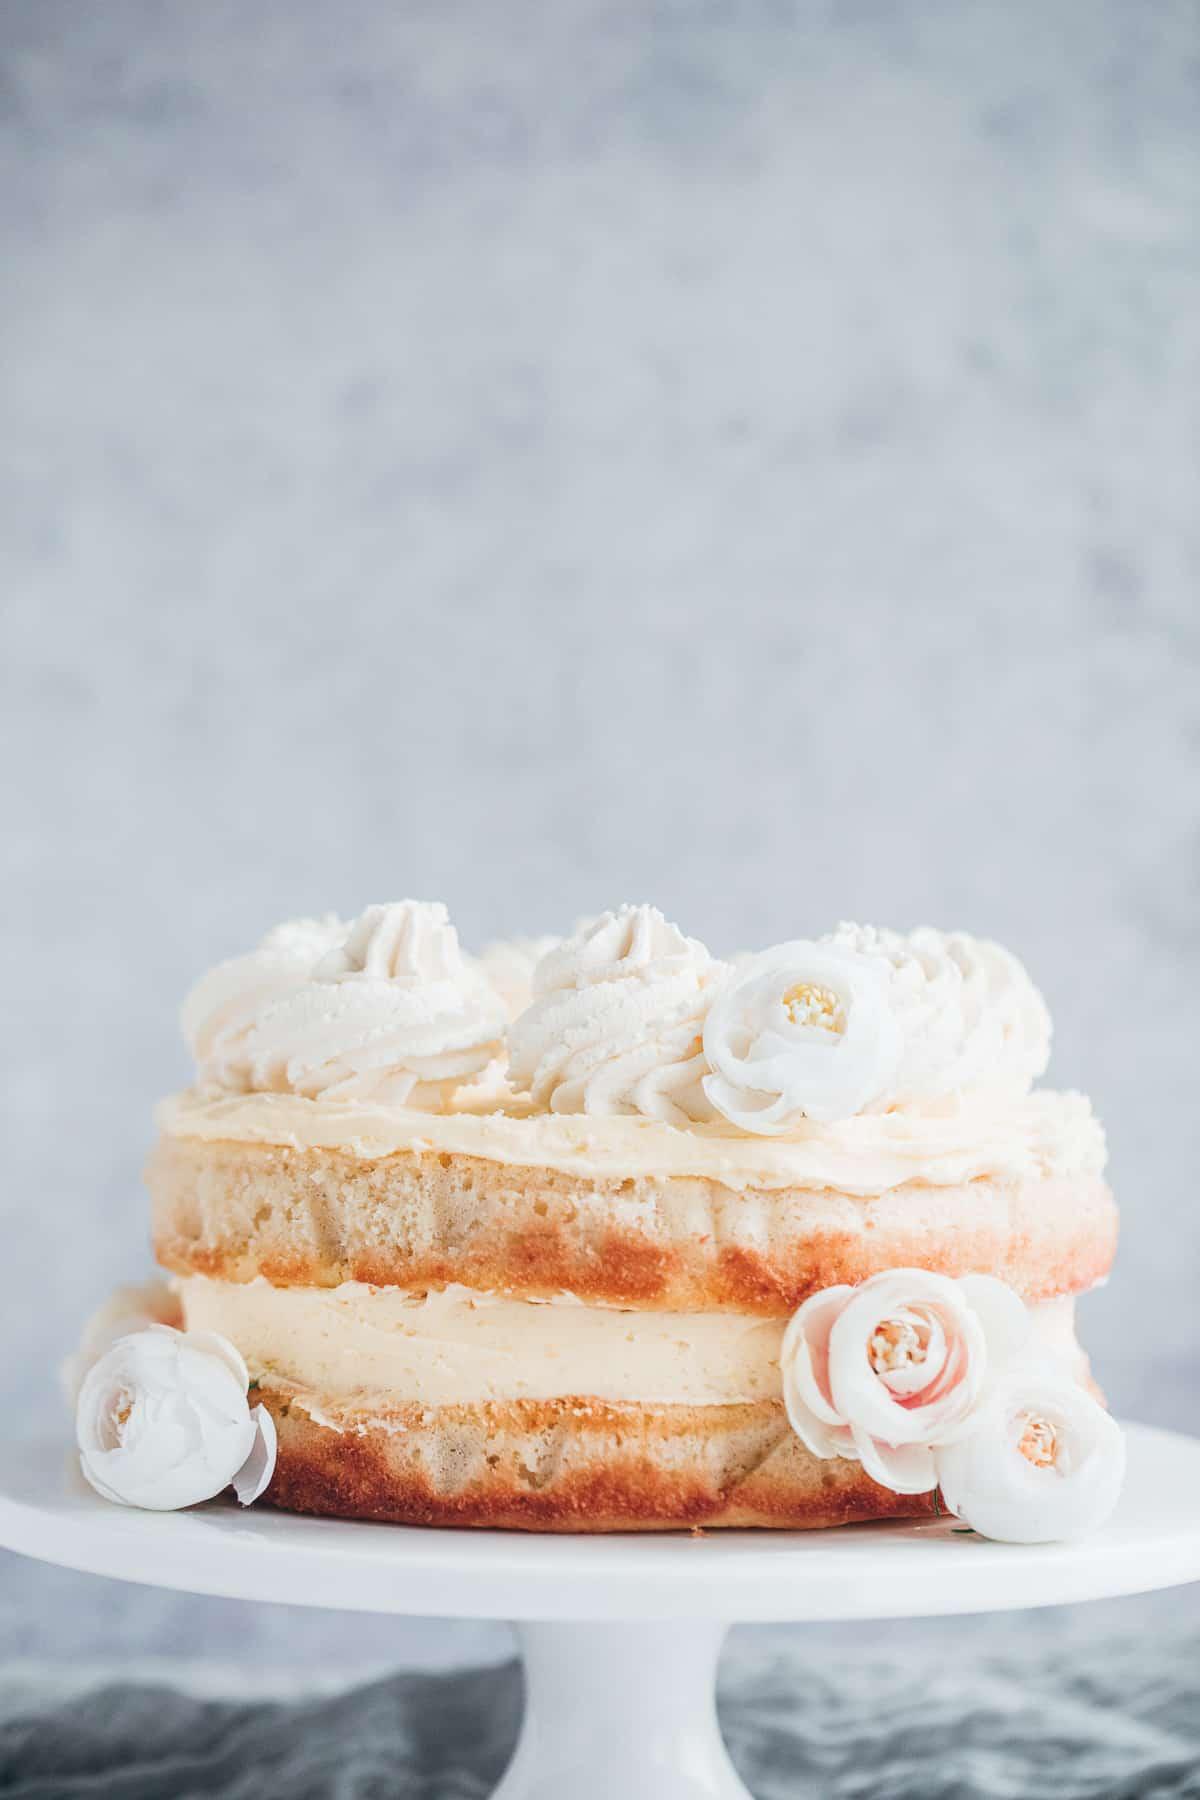 A lemon cake decorated with fresh cream swirls.